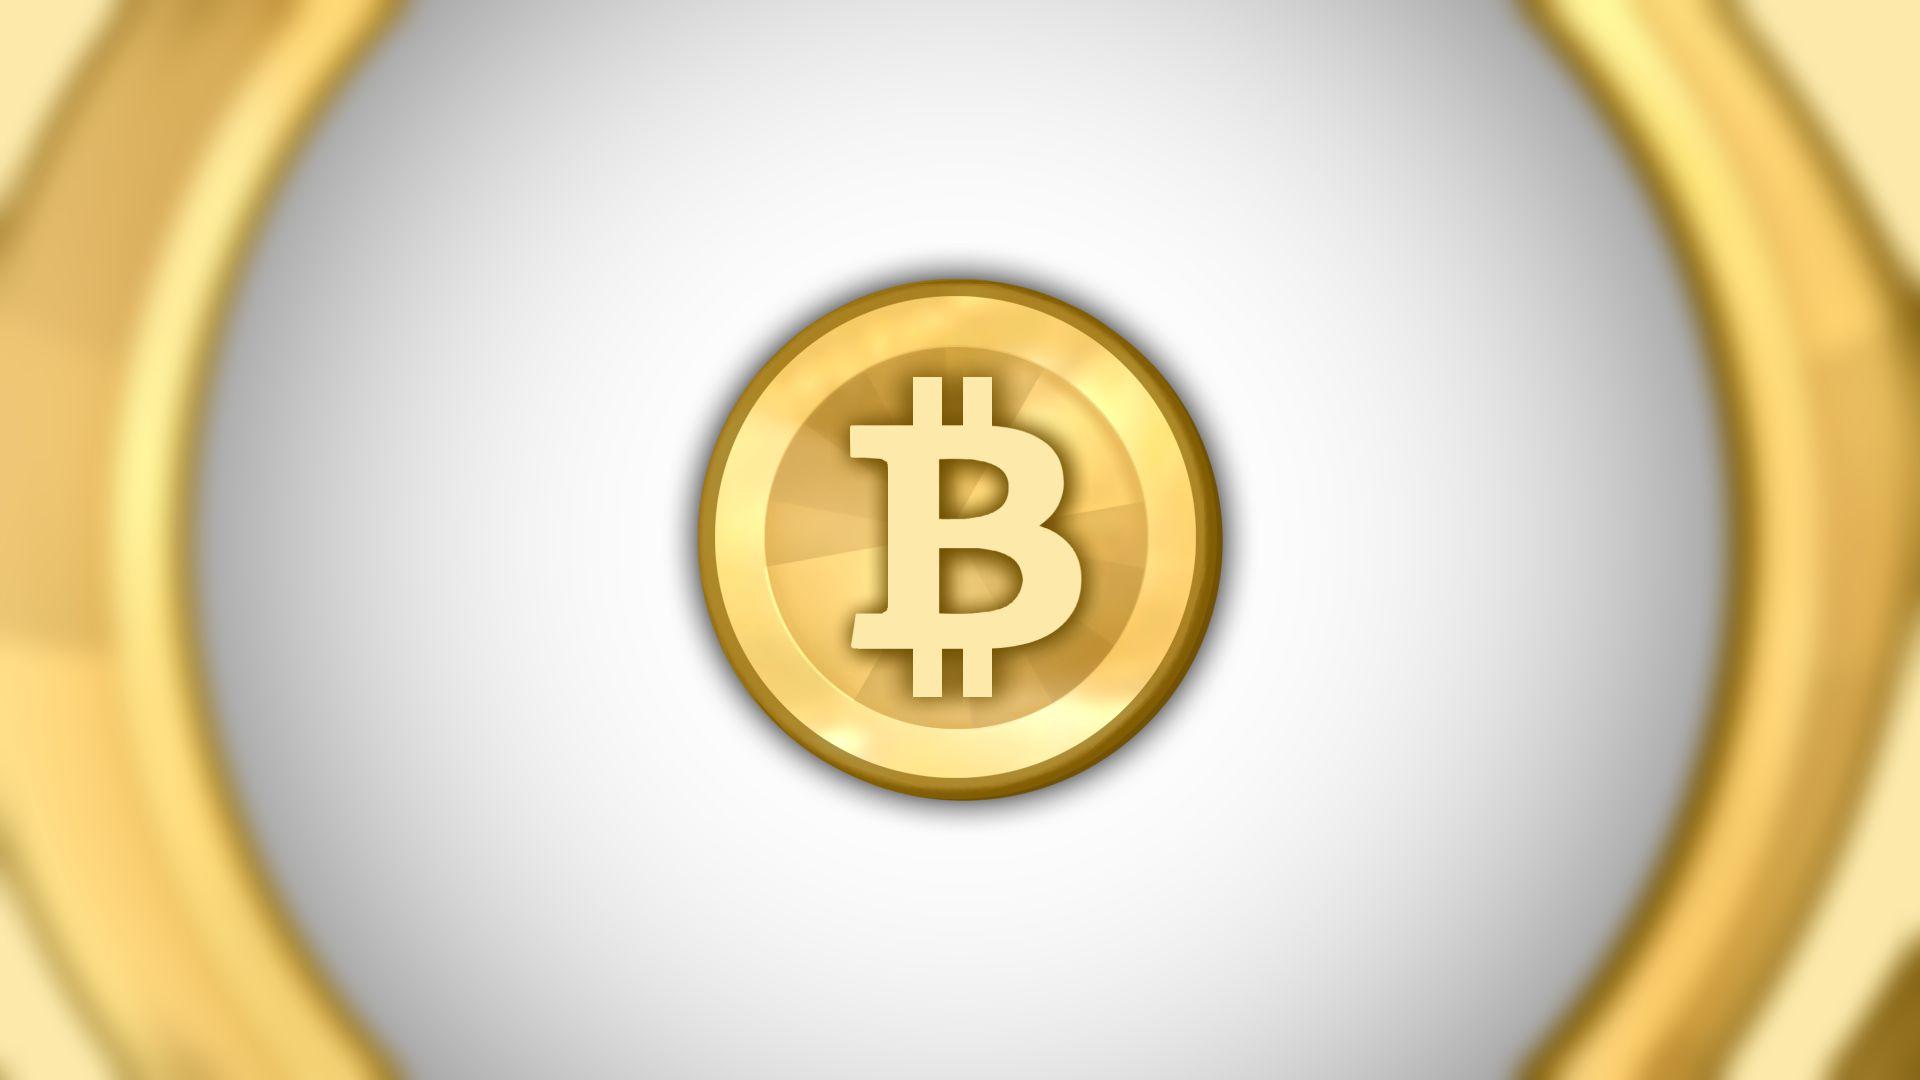 HD Gray, Gold - Bitcoin Wallpaper